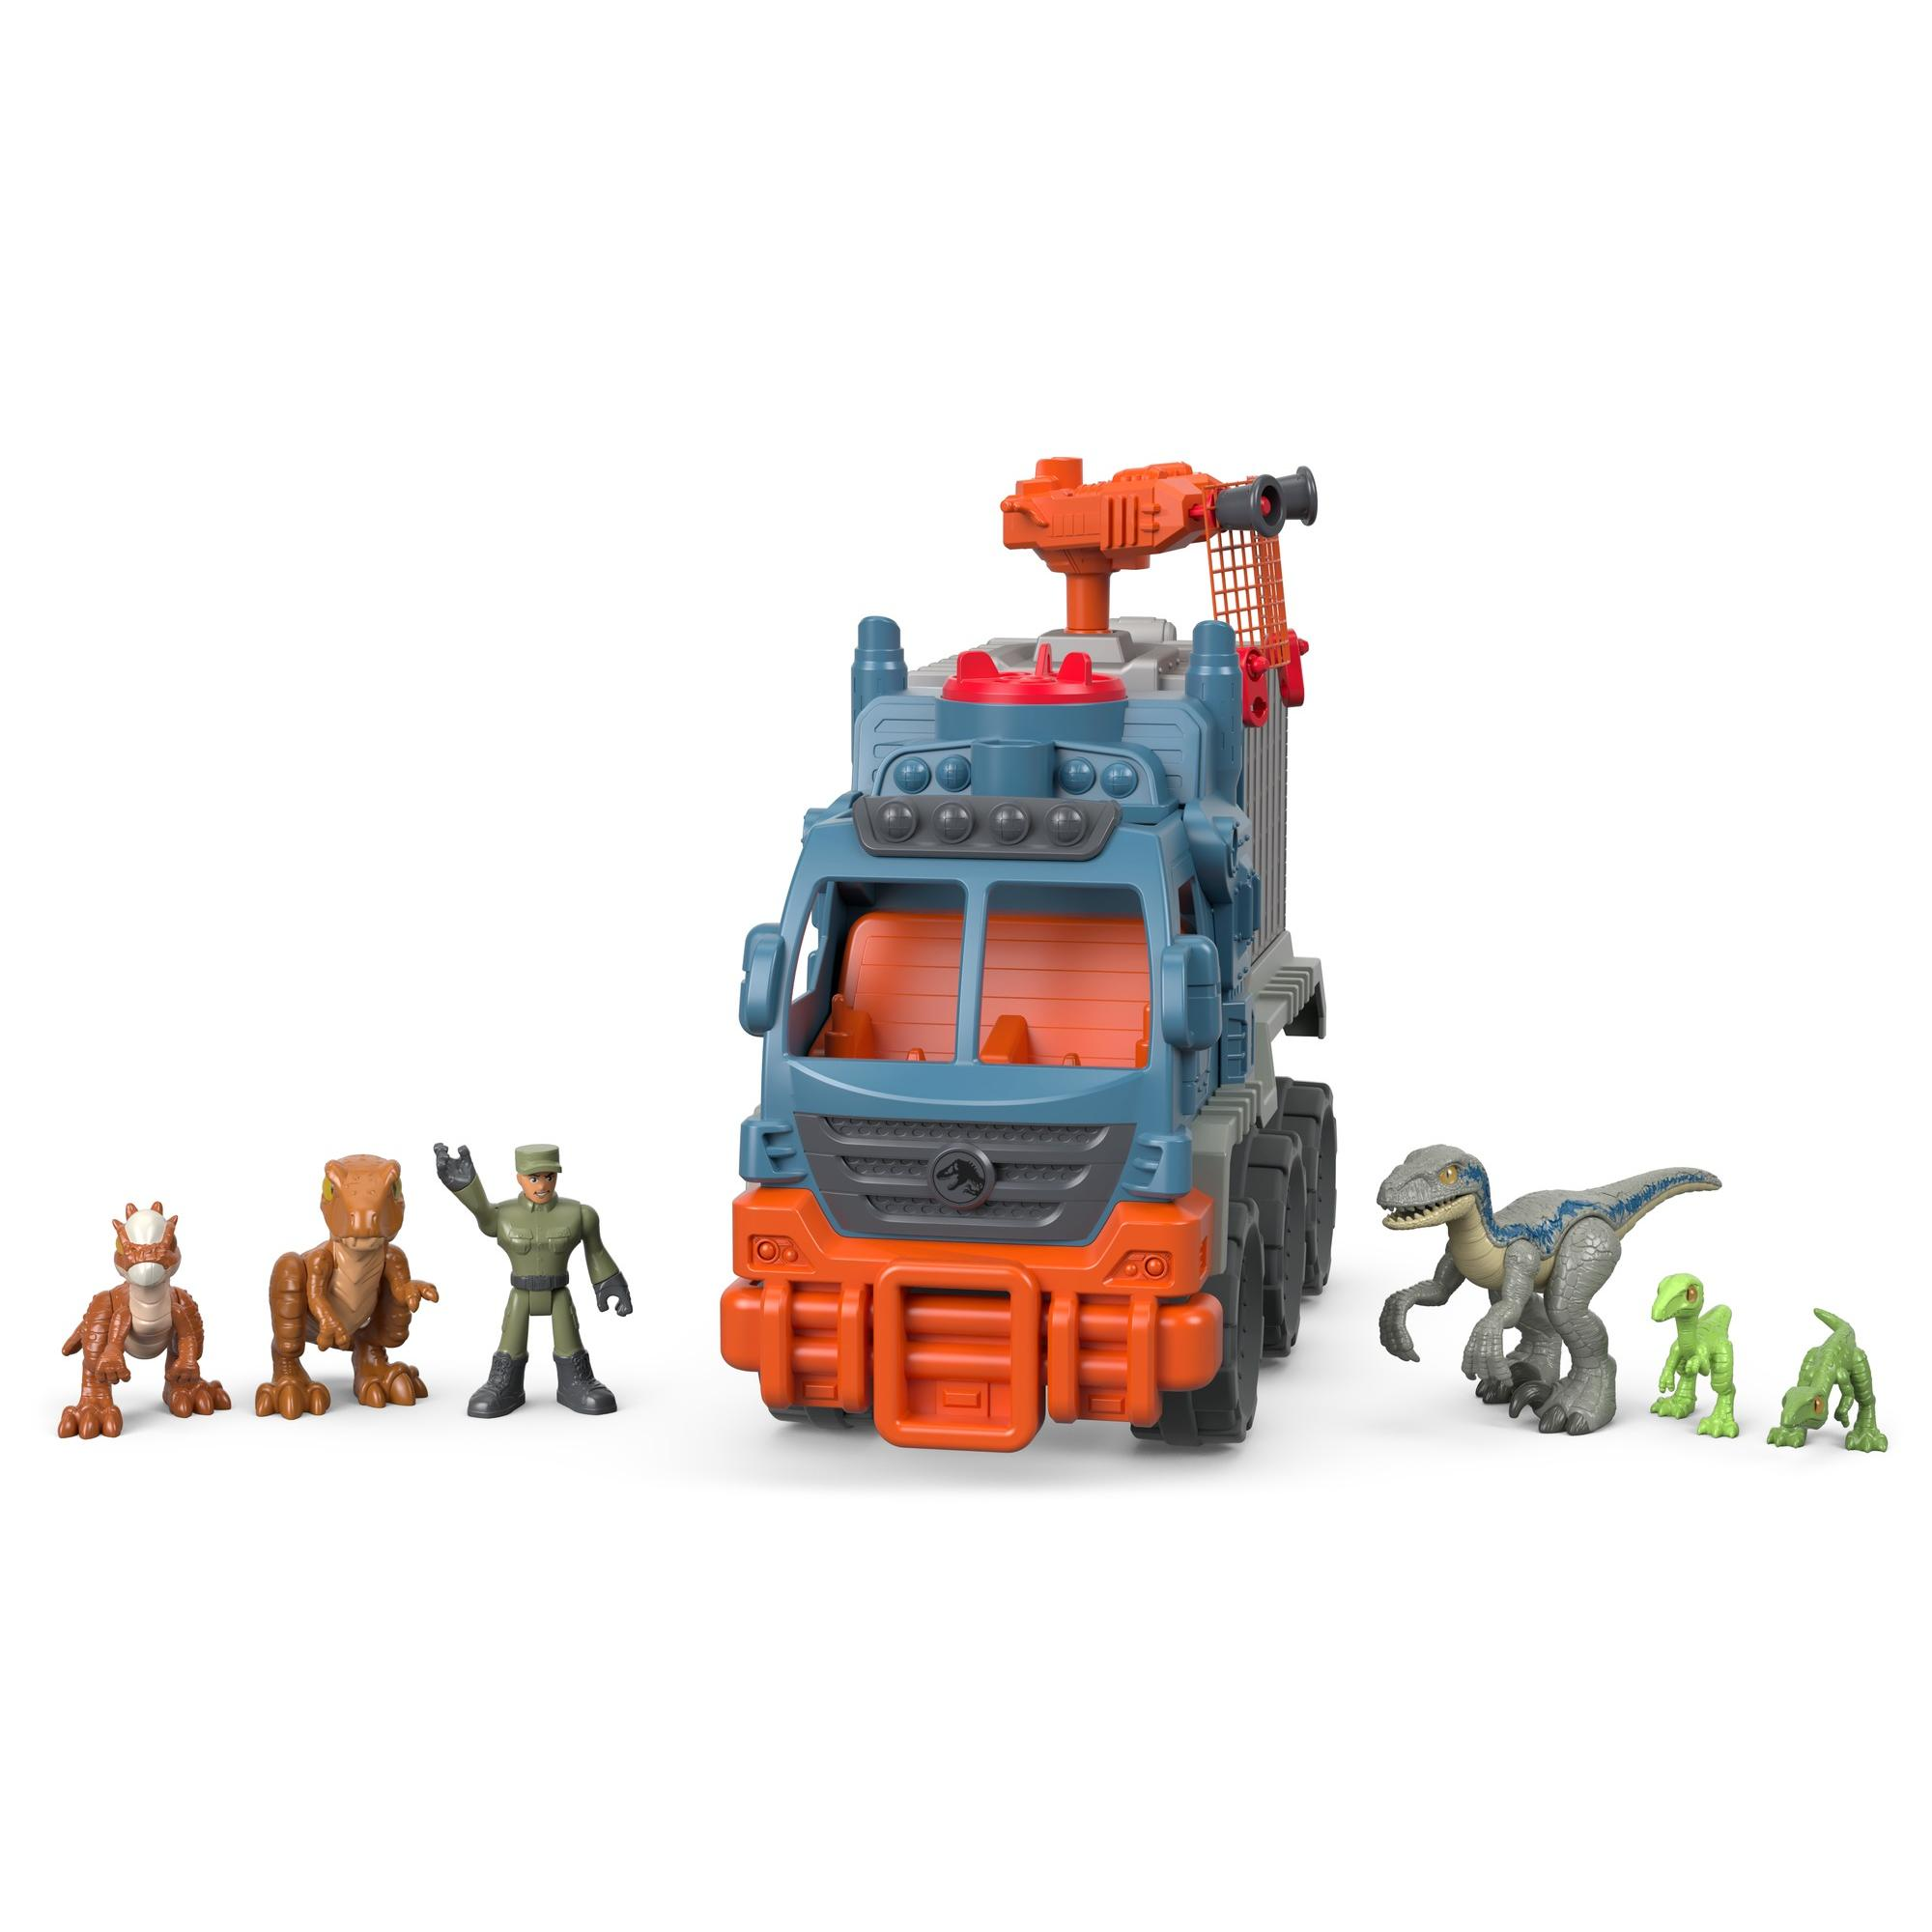 IMaginext Jurassic World Dinosaur Hauler Gift Set by Generic